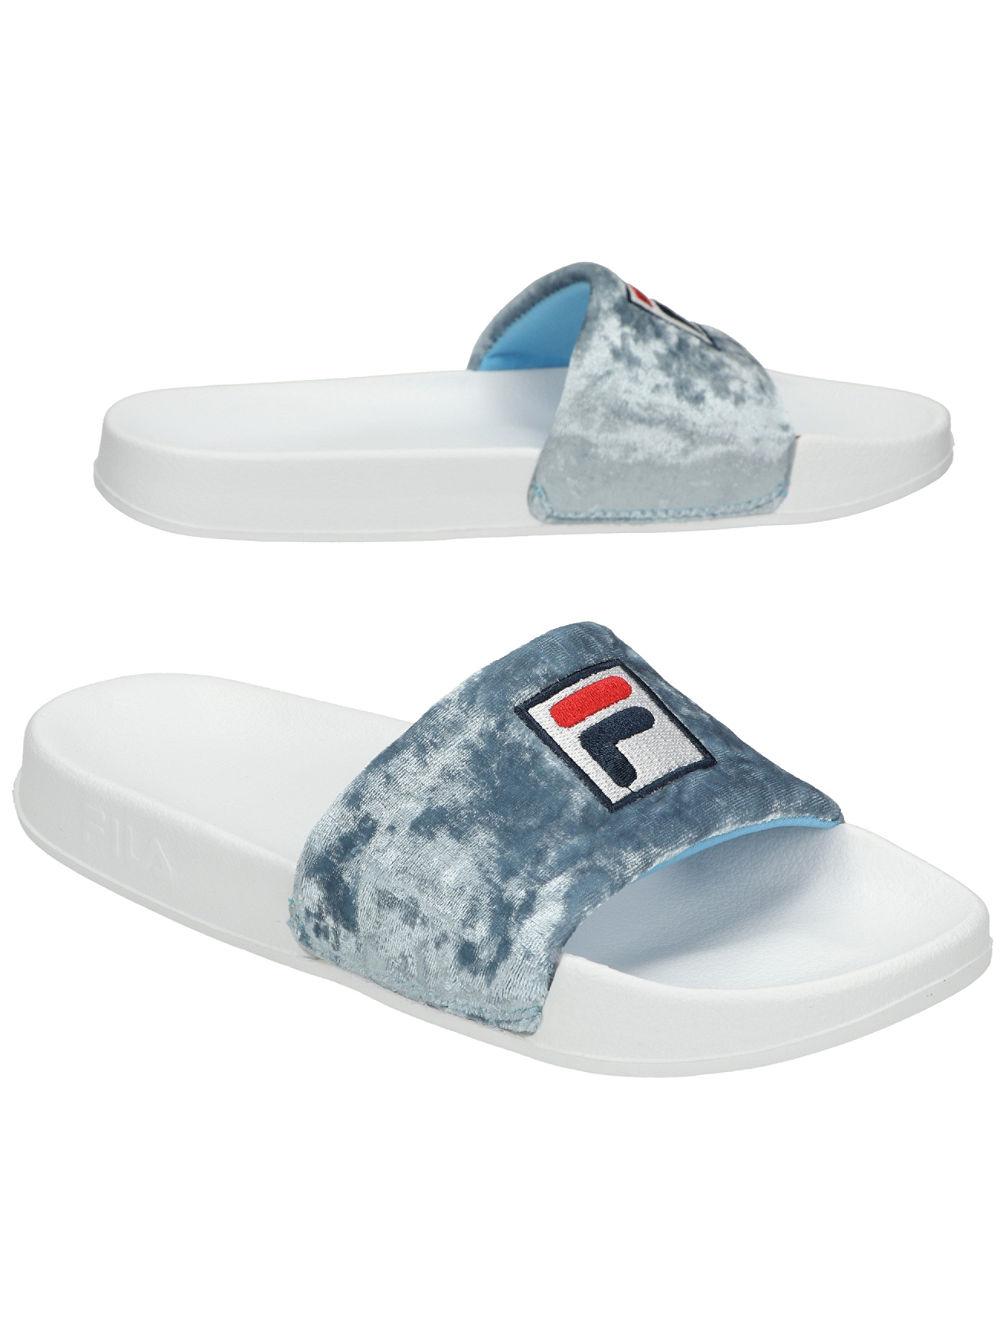 b63efcdca Buy Fila Palm Beach Sandals online at Blue Tomato